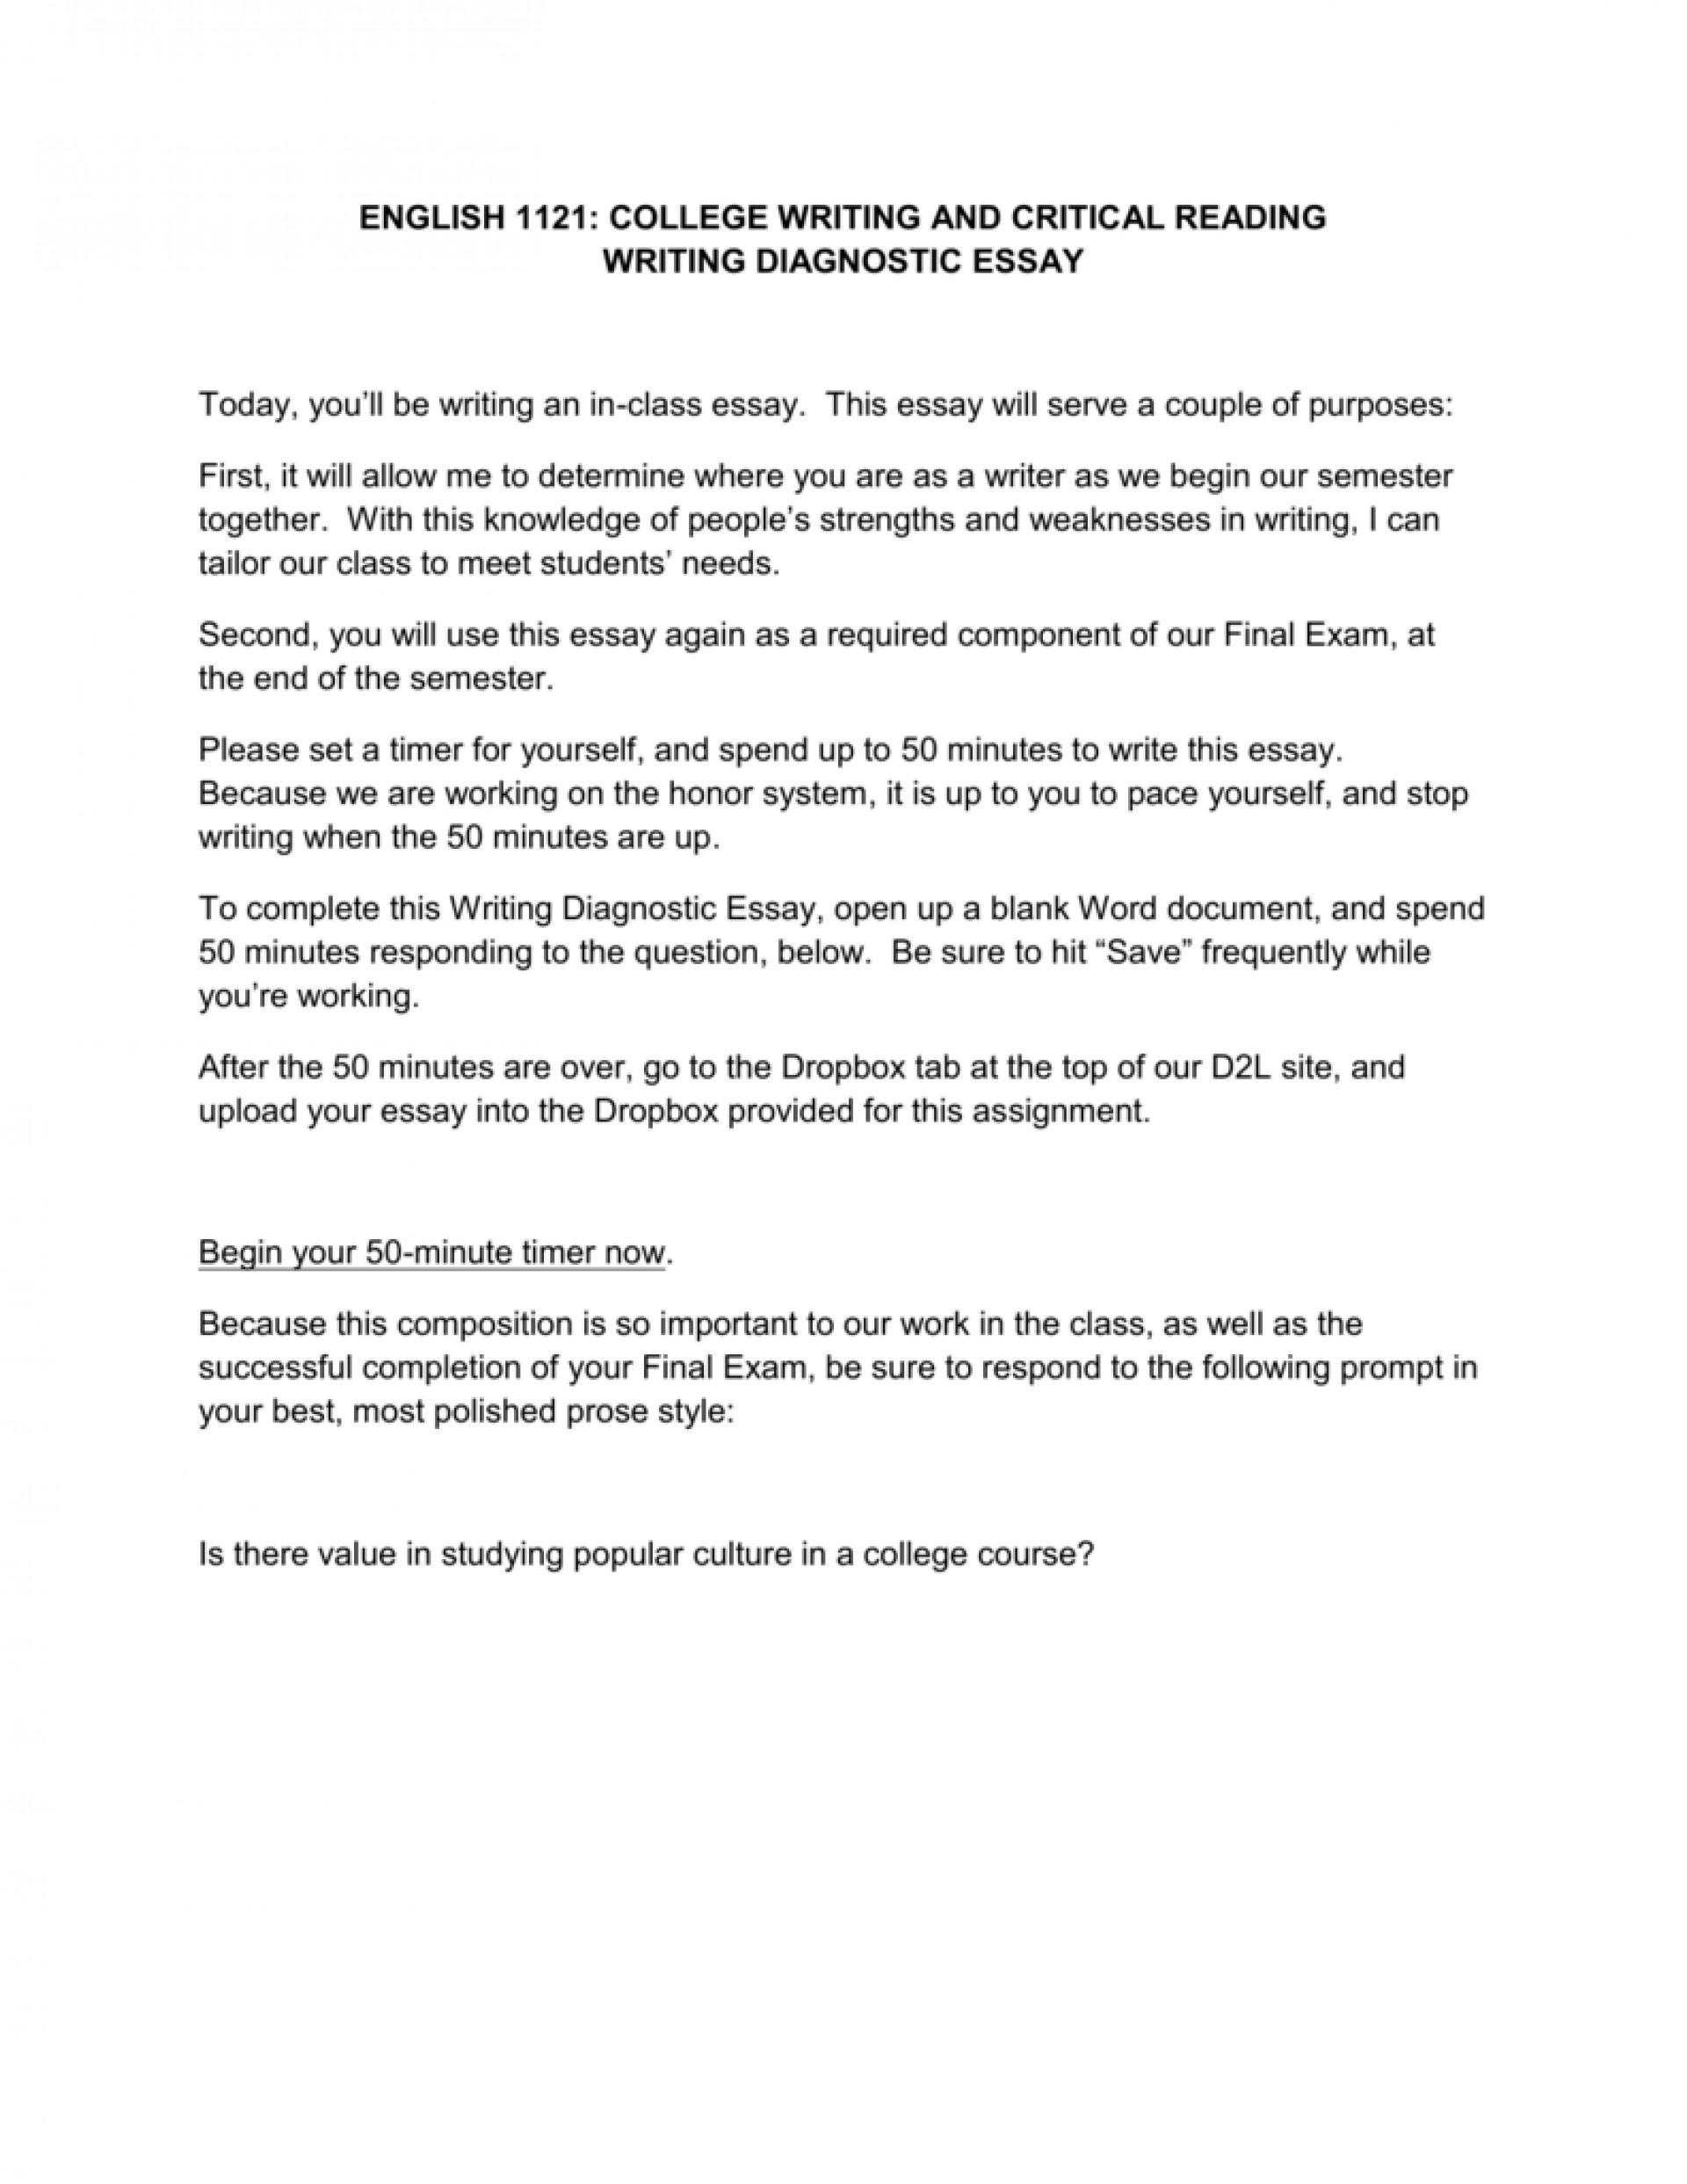 009 Diagnostic Essay 009173466 1 Wondrous Writing Prompts High School Topics Introduction 1920